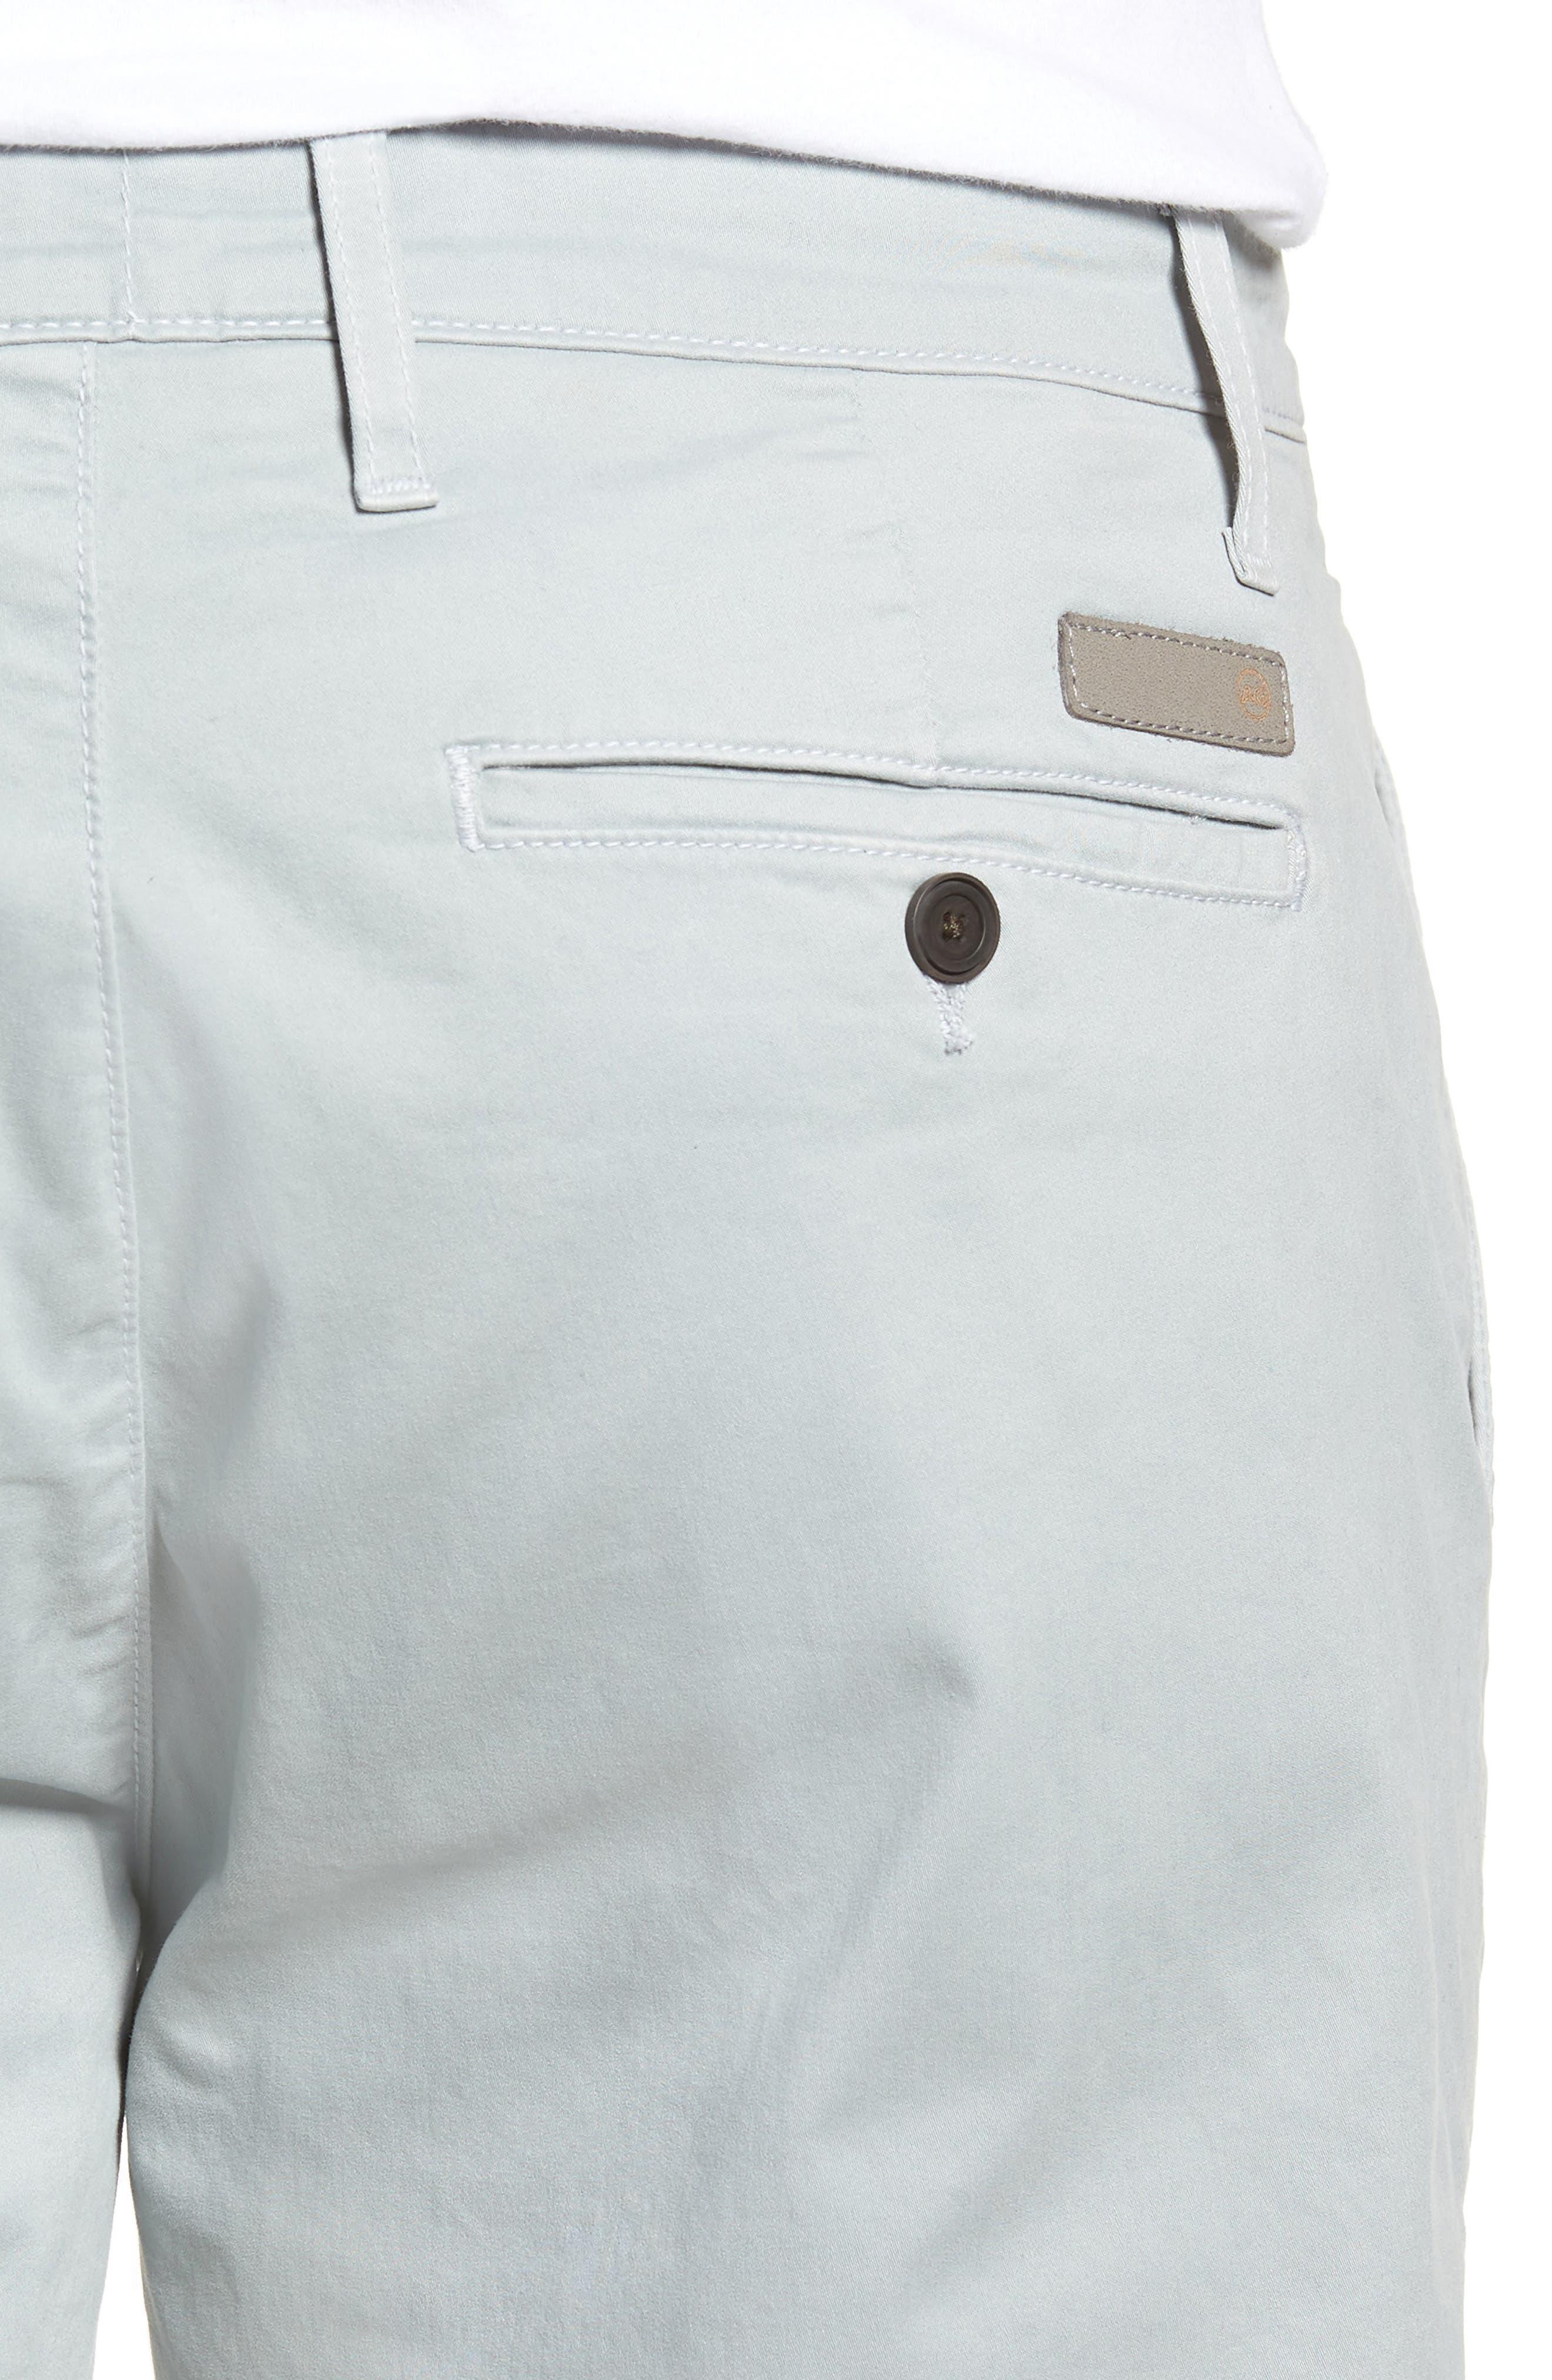 Wanderer Modern Slim Fit Shorts,                             Alternate thumbnail 4, color,                             MORNING MIST